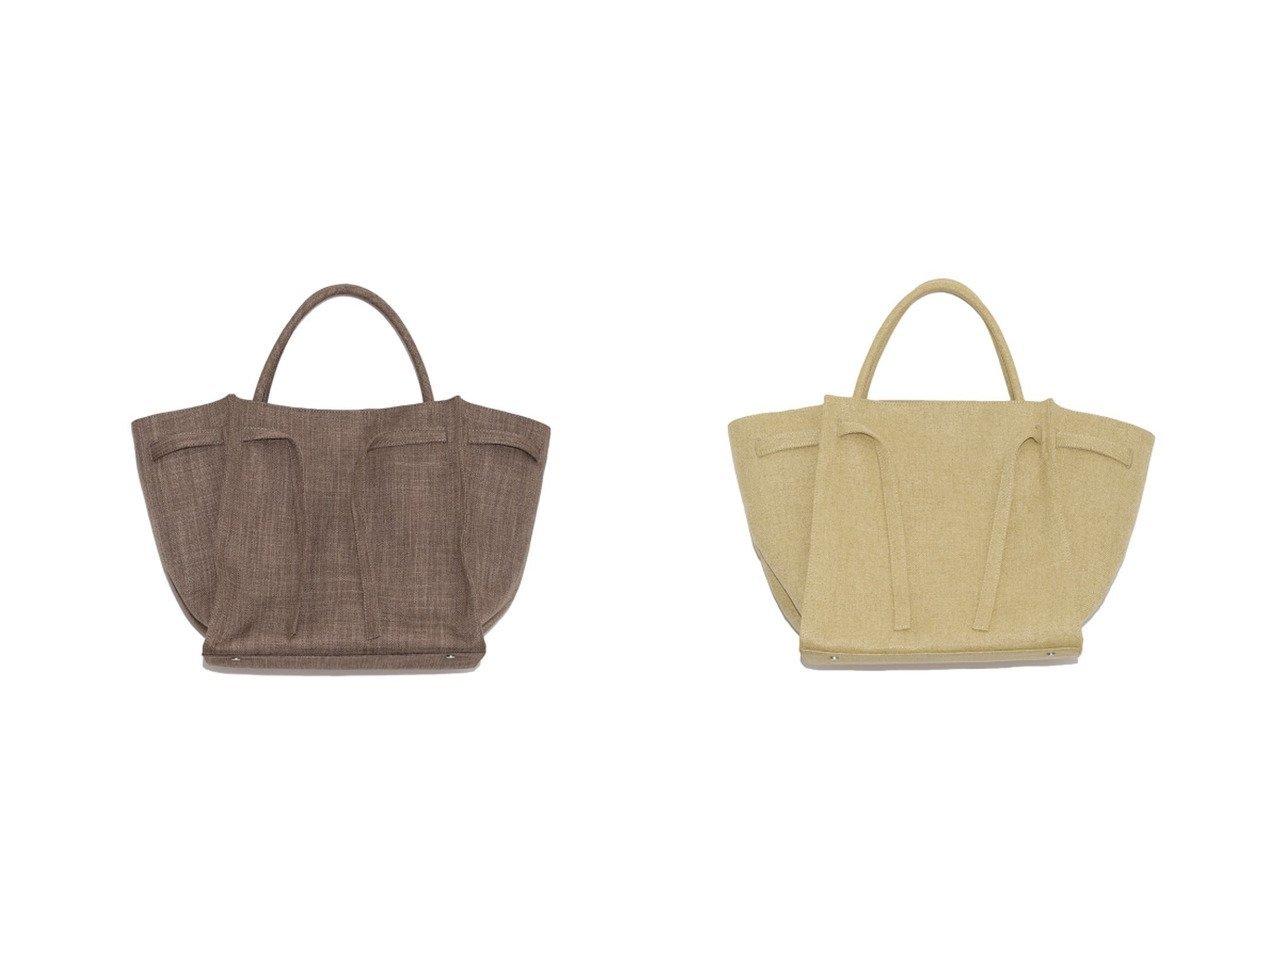 【Mila Owen/ミラオーウェン】のキャンバストートバッグ バッグ・鞄のおすすめ!人気、トレンド・レディースファッションの通販 おすすめで人気の流行・トレンド、ファッションの通販商品 メンズファッション・キッズファッション・インテリア・家具・レディースファッション・服の通販 founy(ファニー) https://founy.com/ ファッション Fashion レディースファッション WOMEN バッグ Bag 春 Spring キャンバス クラシック スマート ポケット リネン 2021年 2021 S/S 春夏 SS Spring/Summer 2021 春夏 S/S SS Spring/Summer 2021 |ID:crp329100000014990